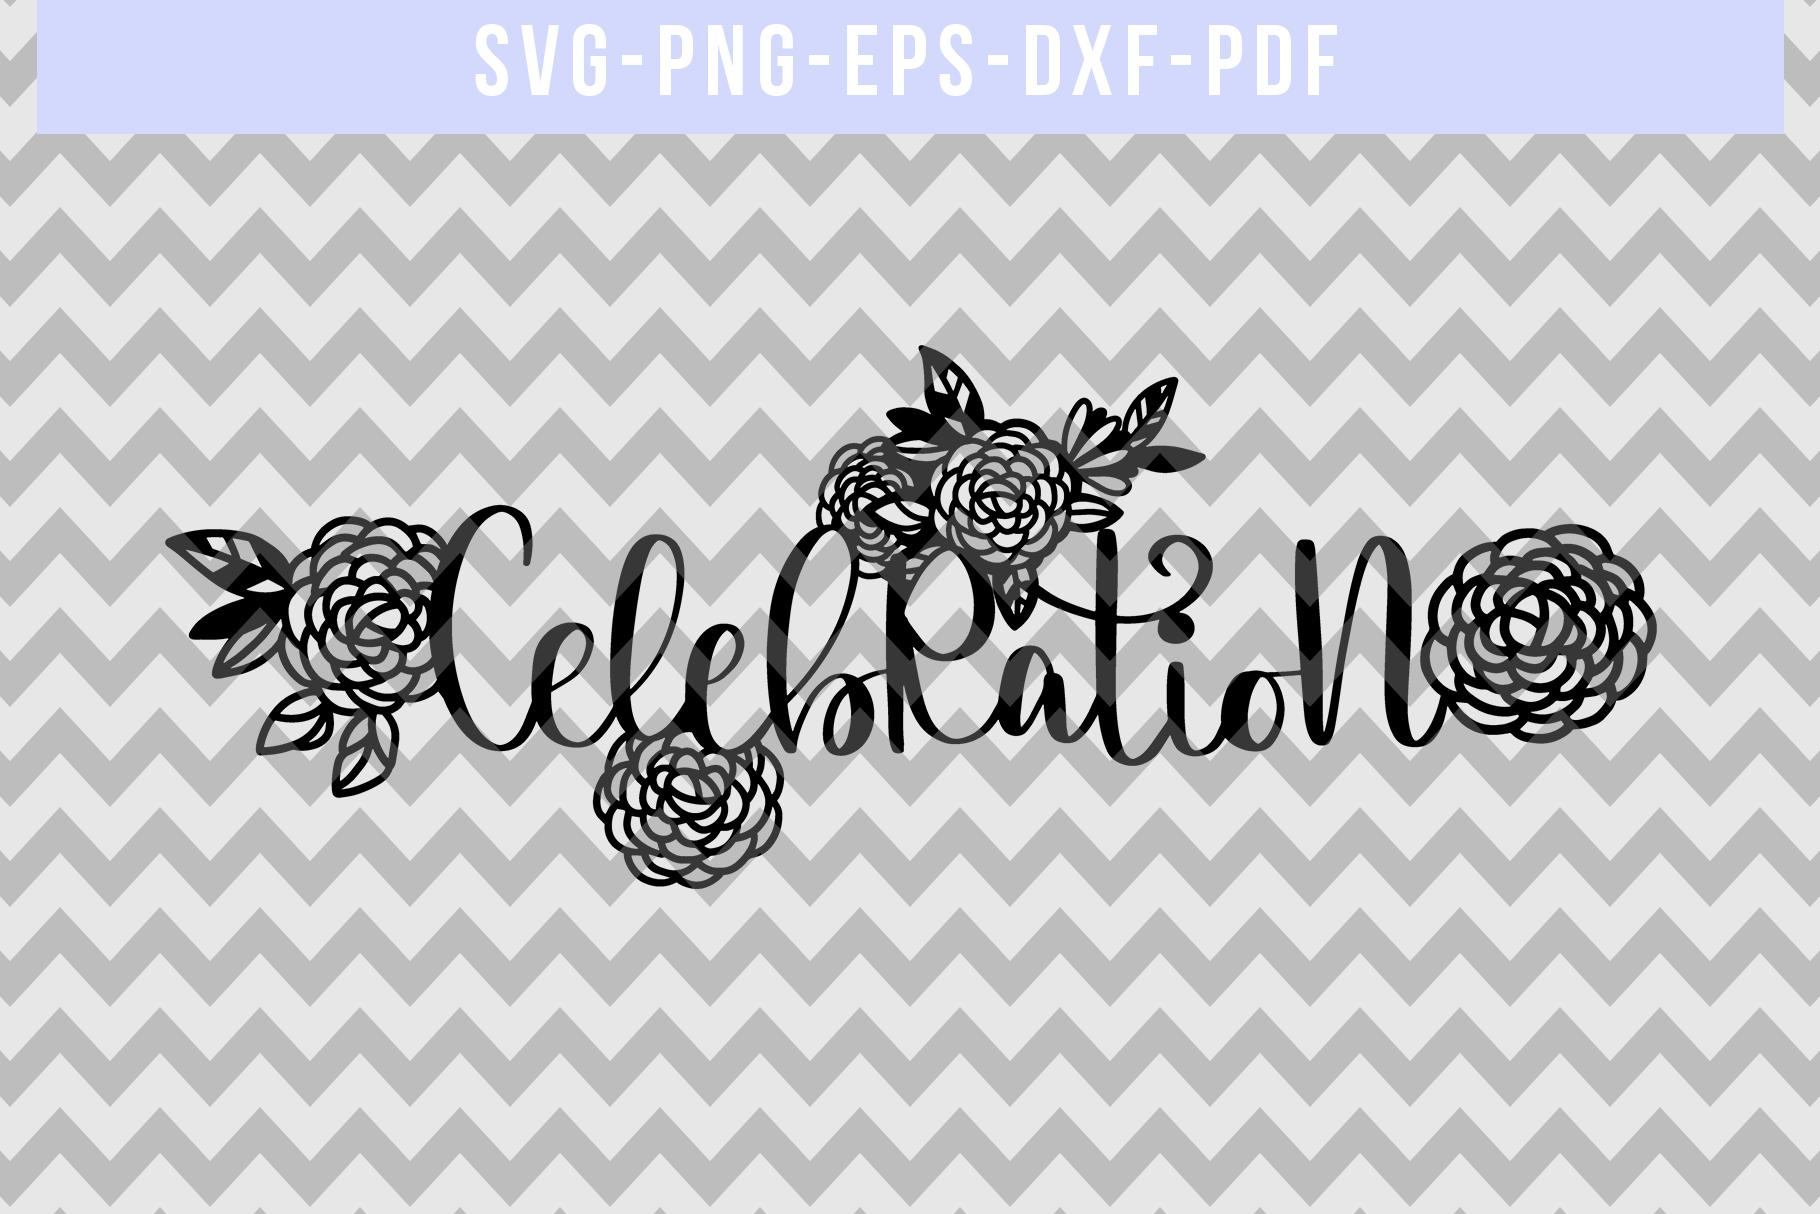 Celebration Papercut Template, Wedding Invitation SVG, PDF example image 4